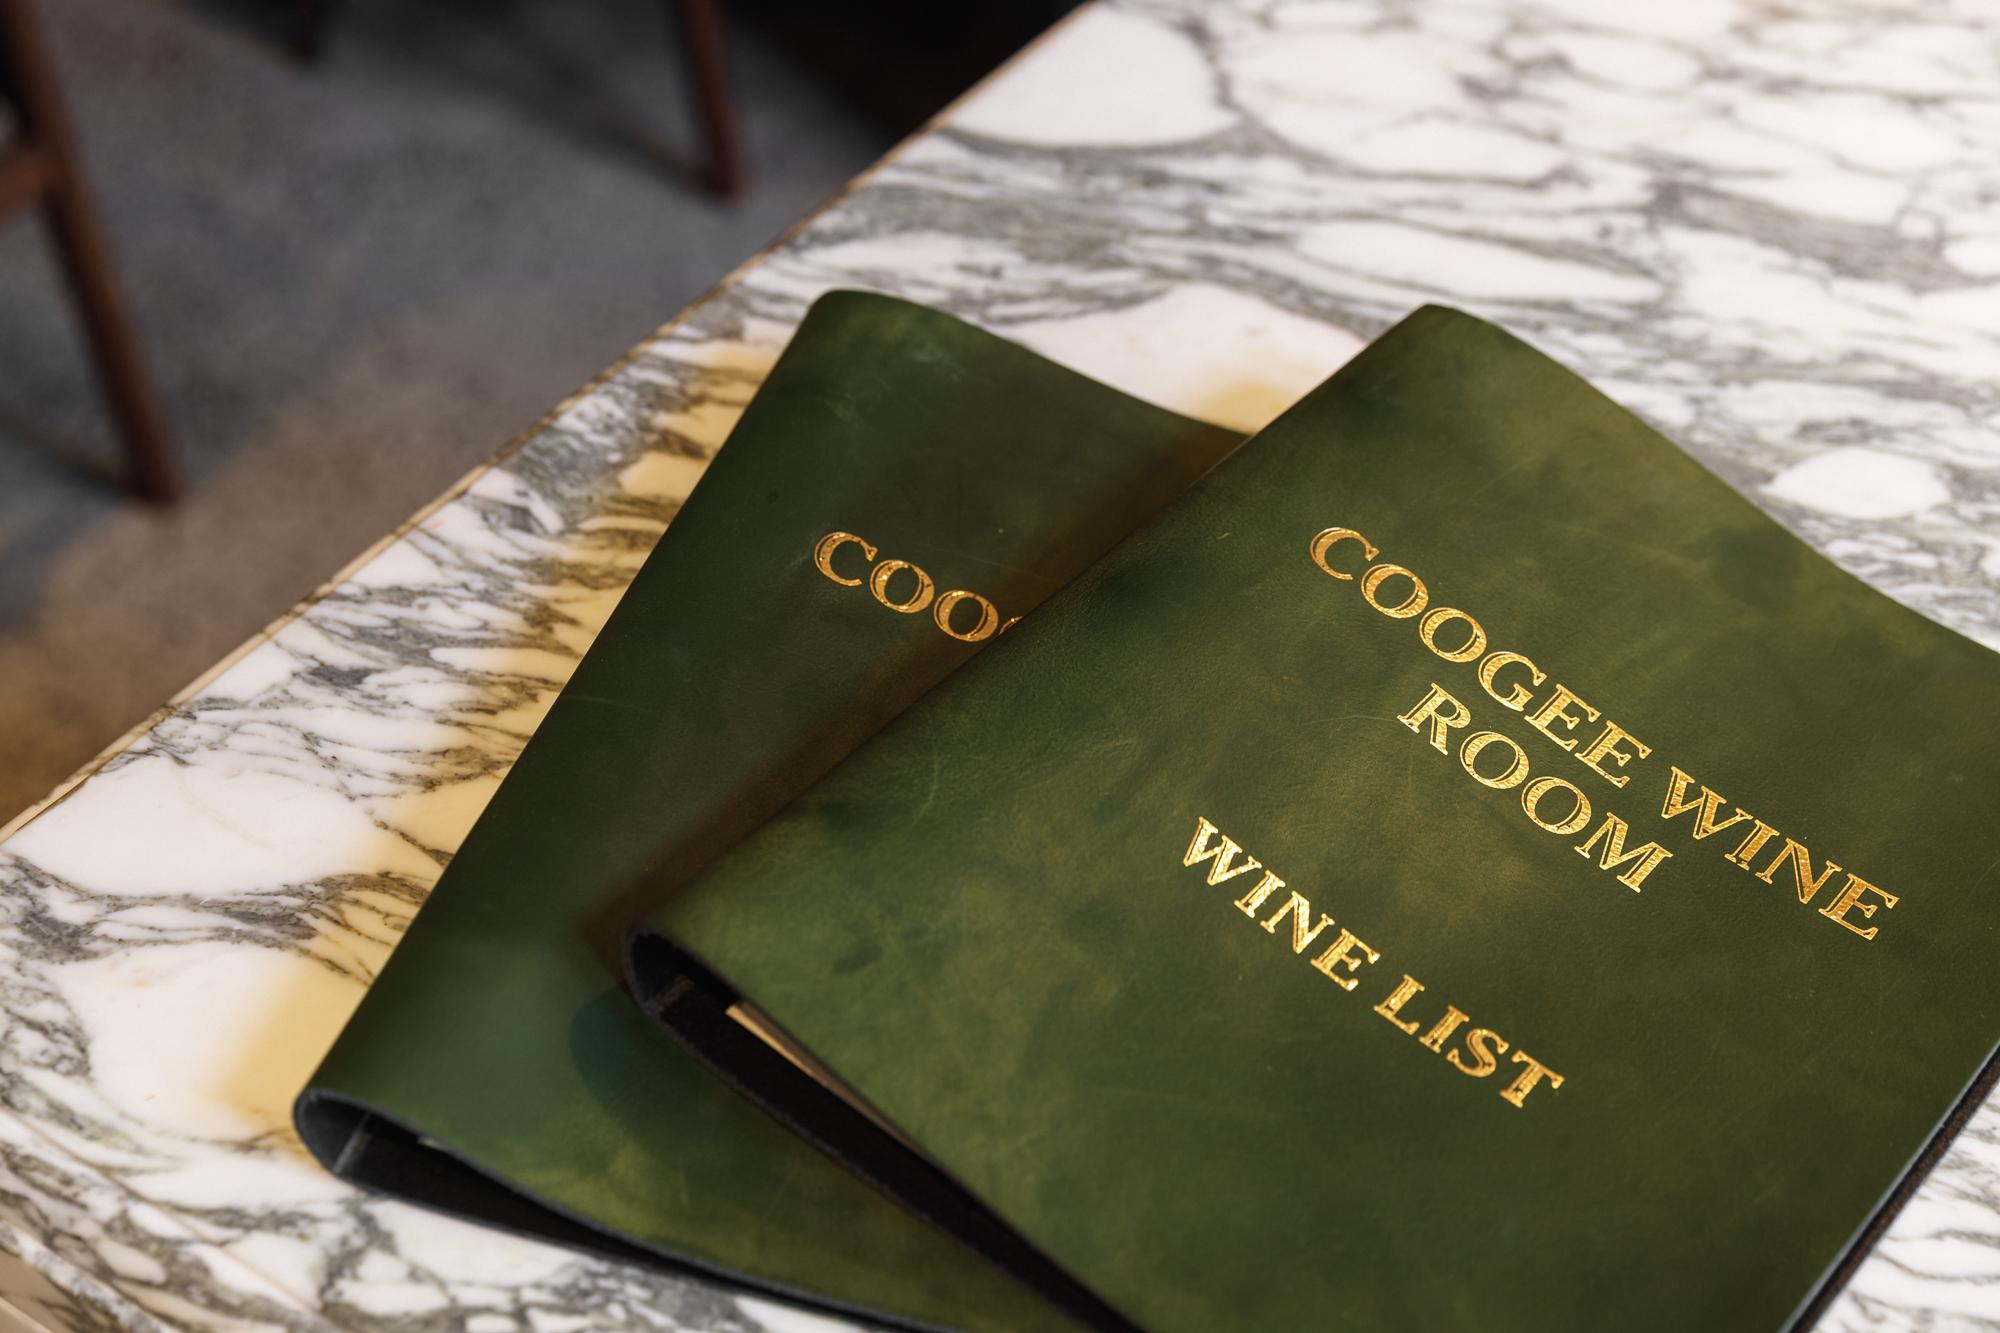 Distil coogee wine room logo branding menu covers green leather